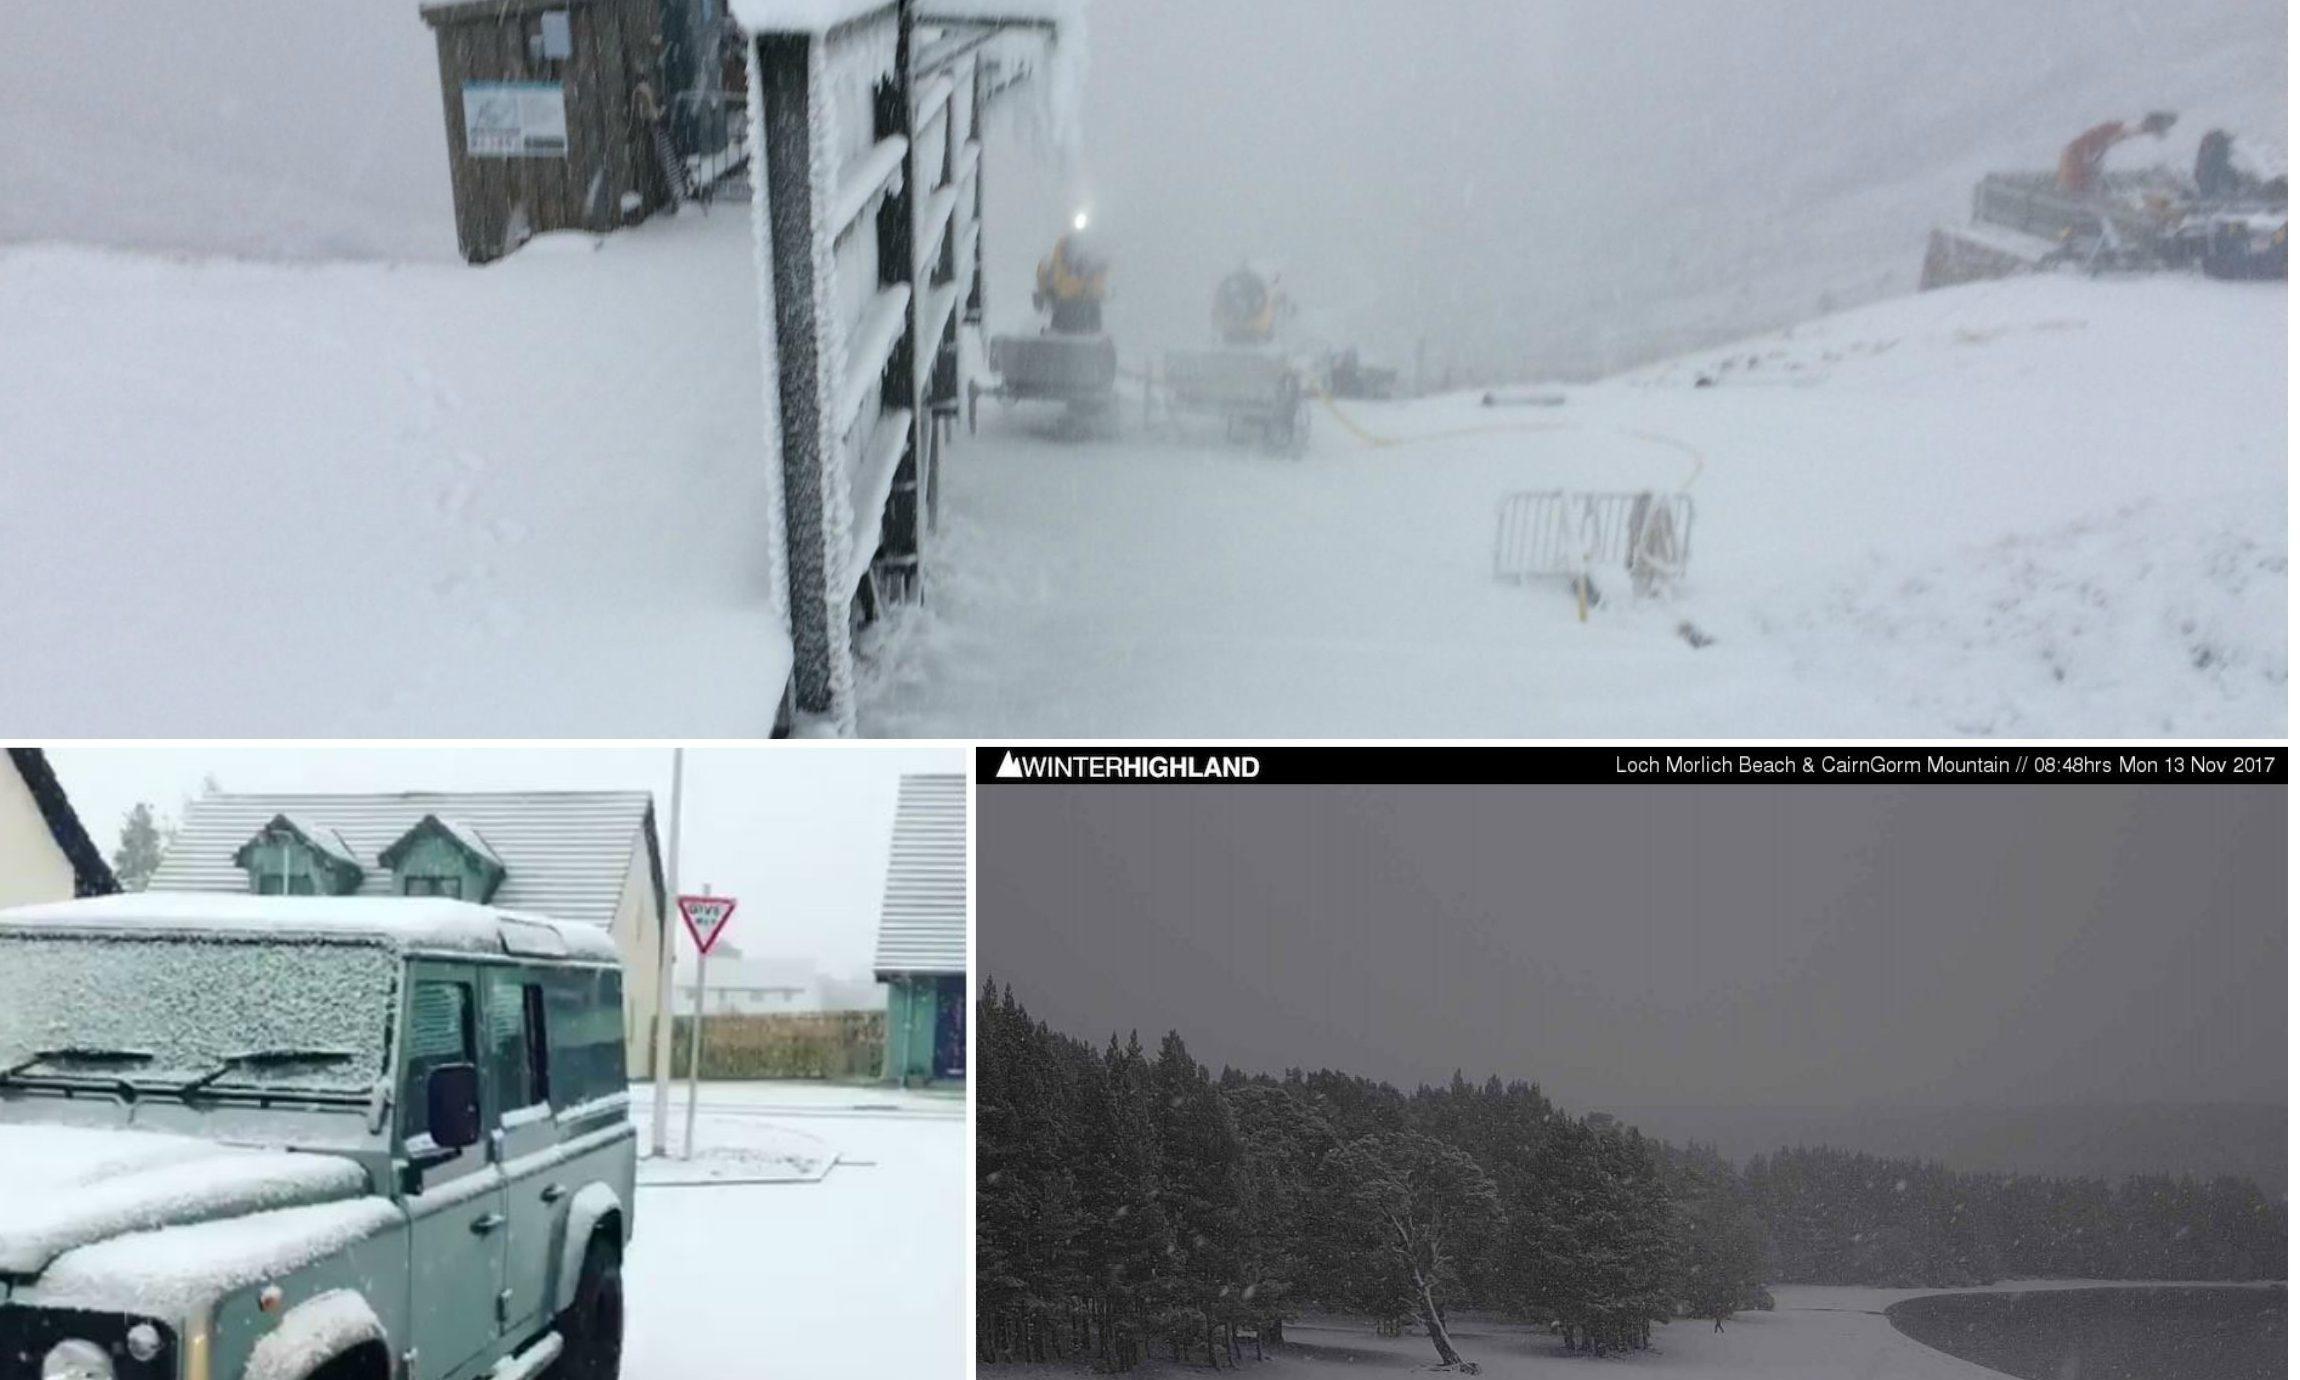 Snow hit Scotland this morning. Credit: Cairngorm Mountain Ltd/Highland Defenders